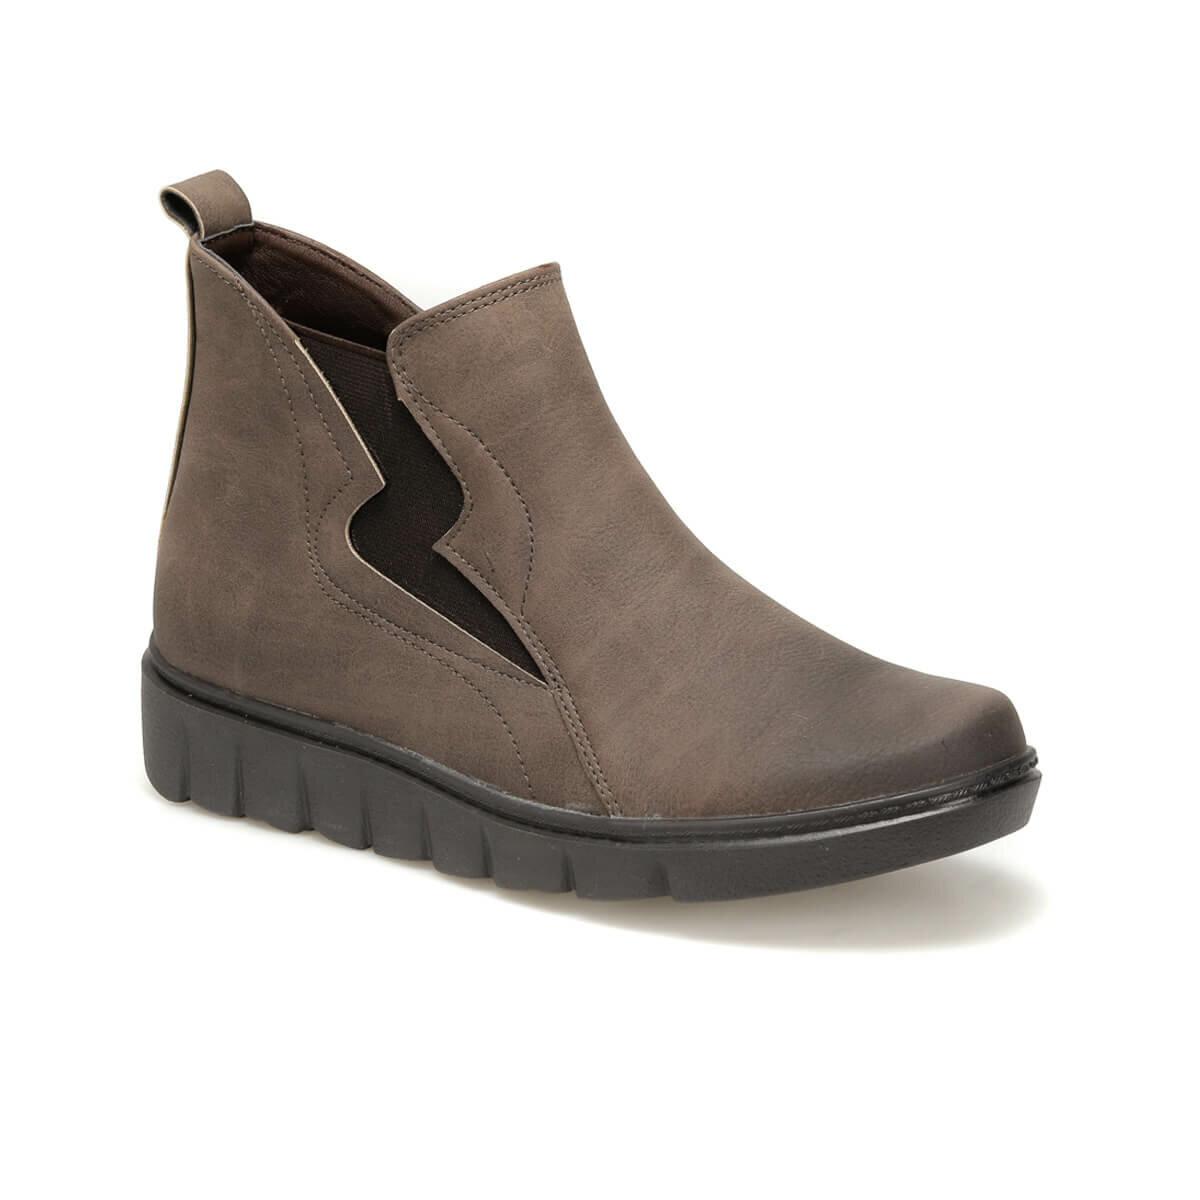 FLO TRV8222 Brown Women 'S Boots Polaris